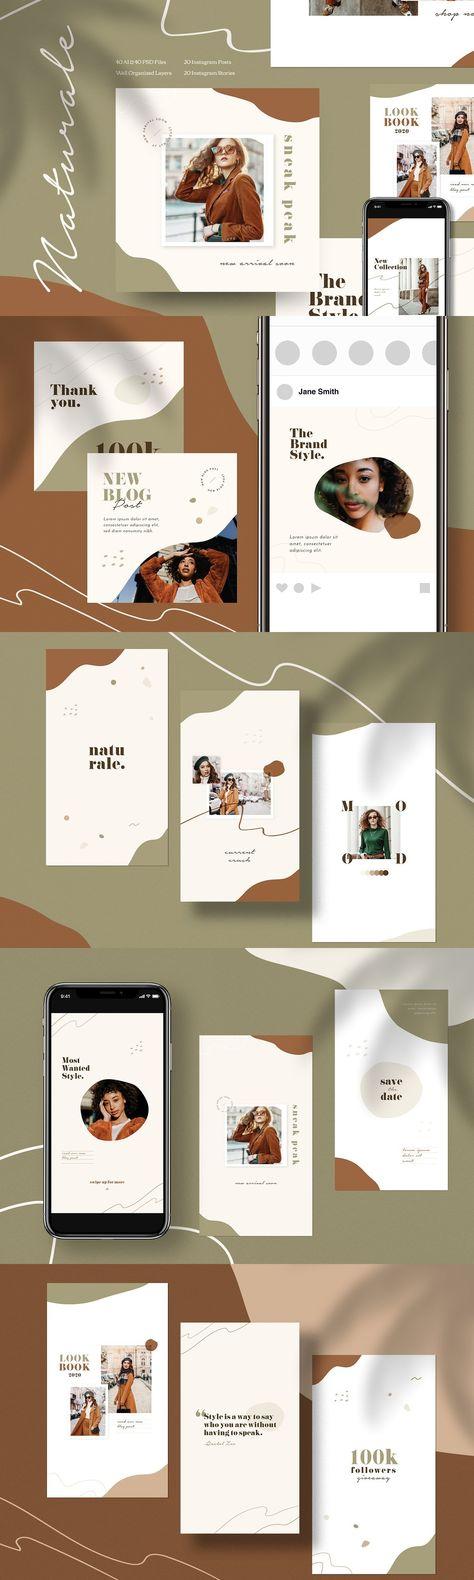 Naturalè - Instagram Stories & Post